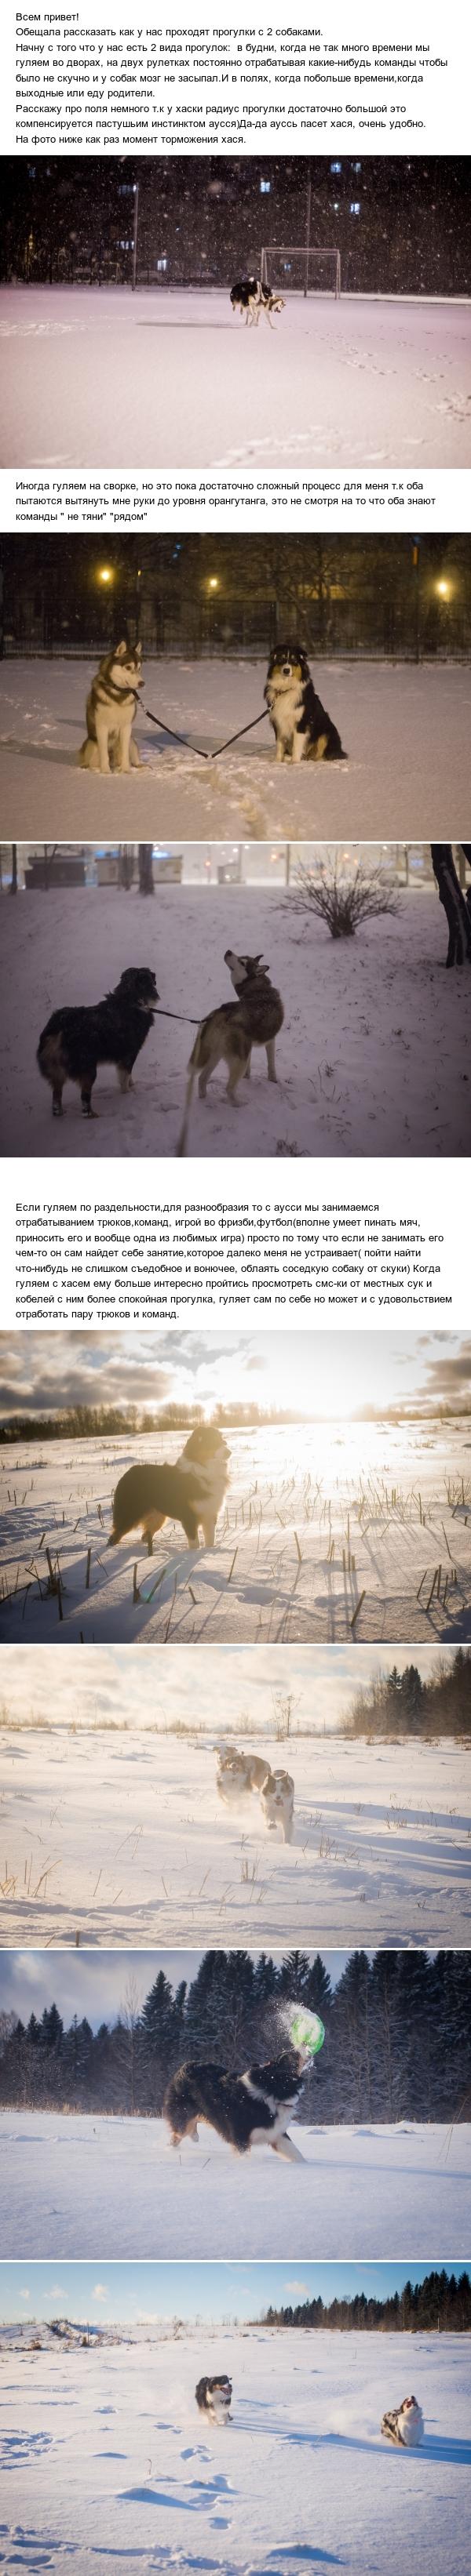 Наши хроники хаусси Хаски, Аусси, Австралийская овчарка, Собака, Длиннопост